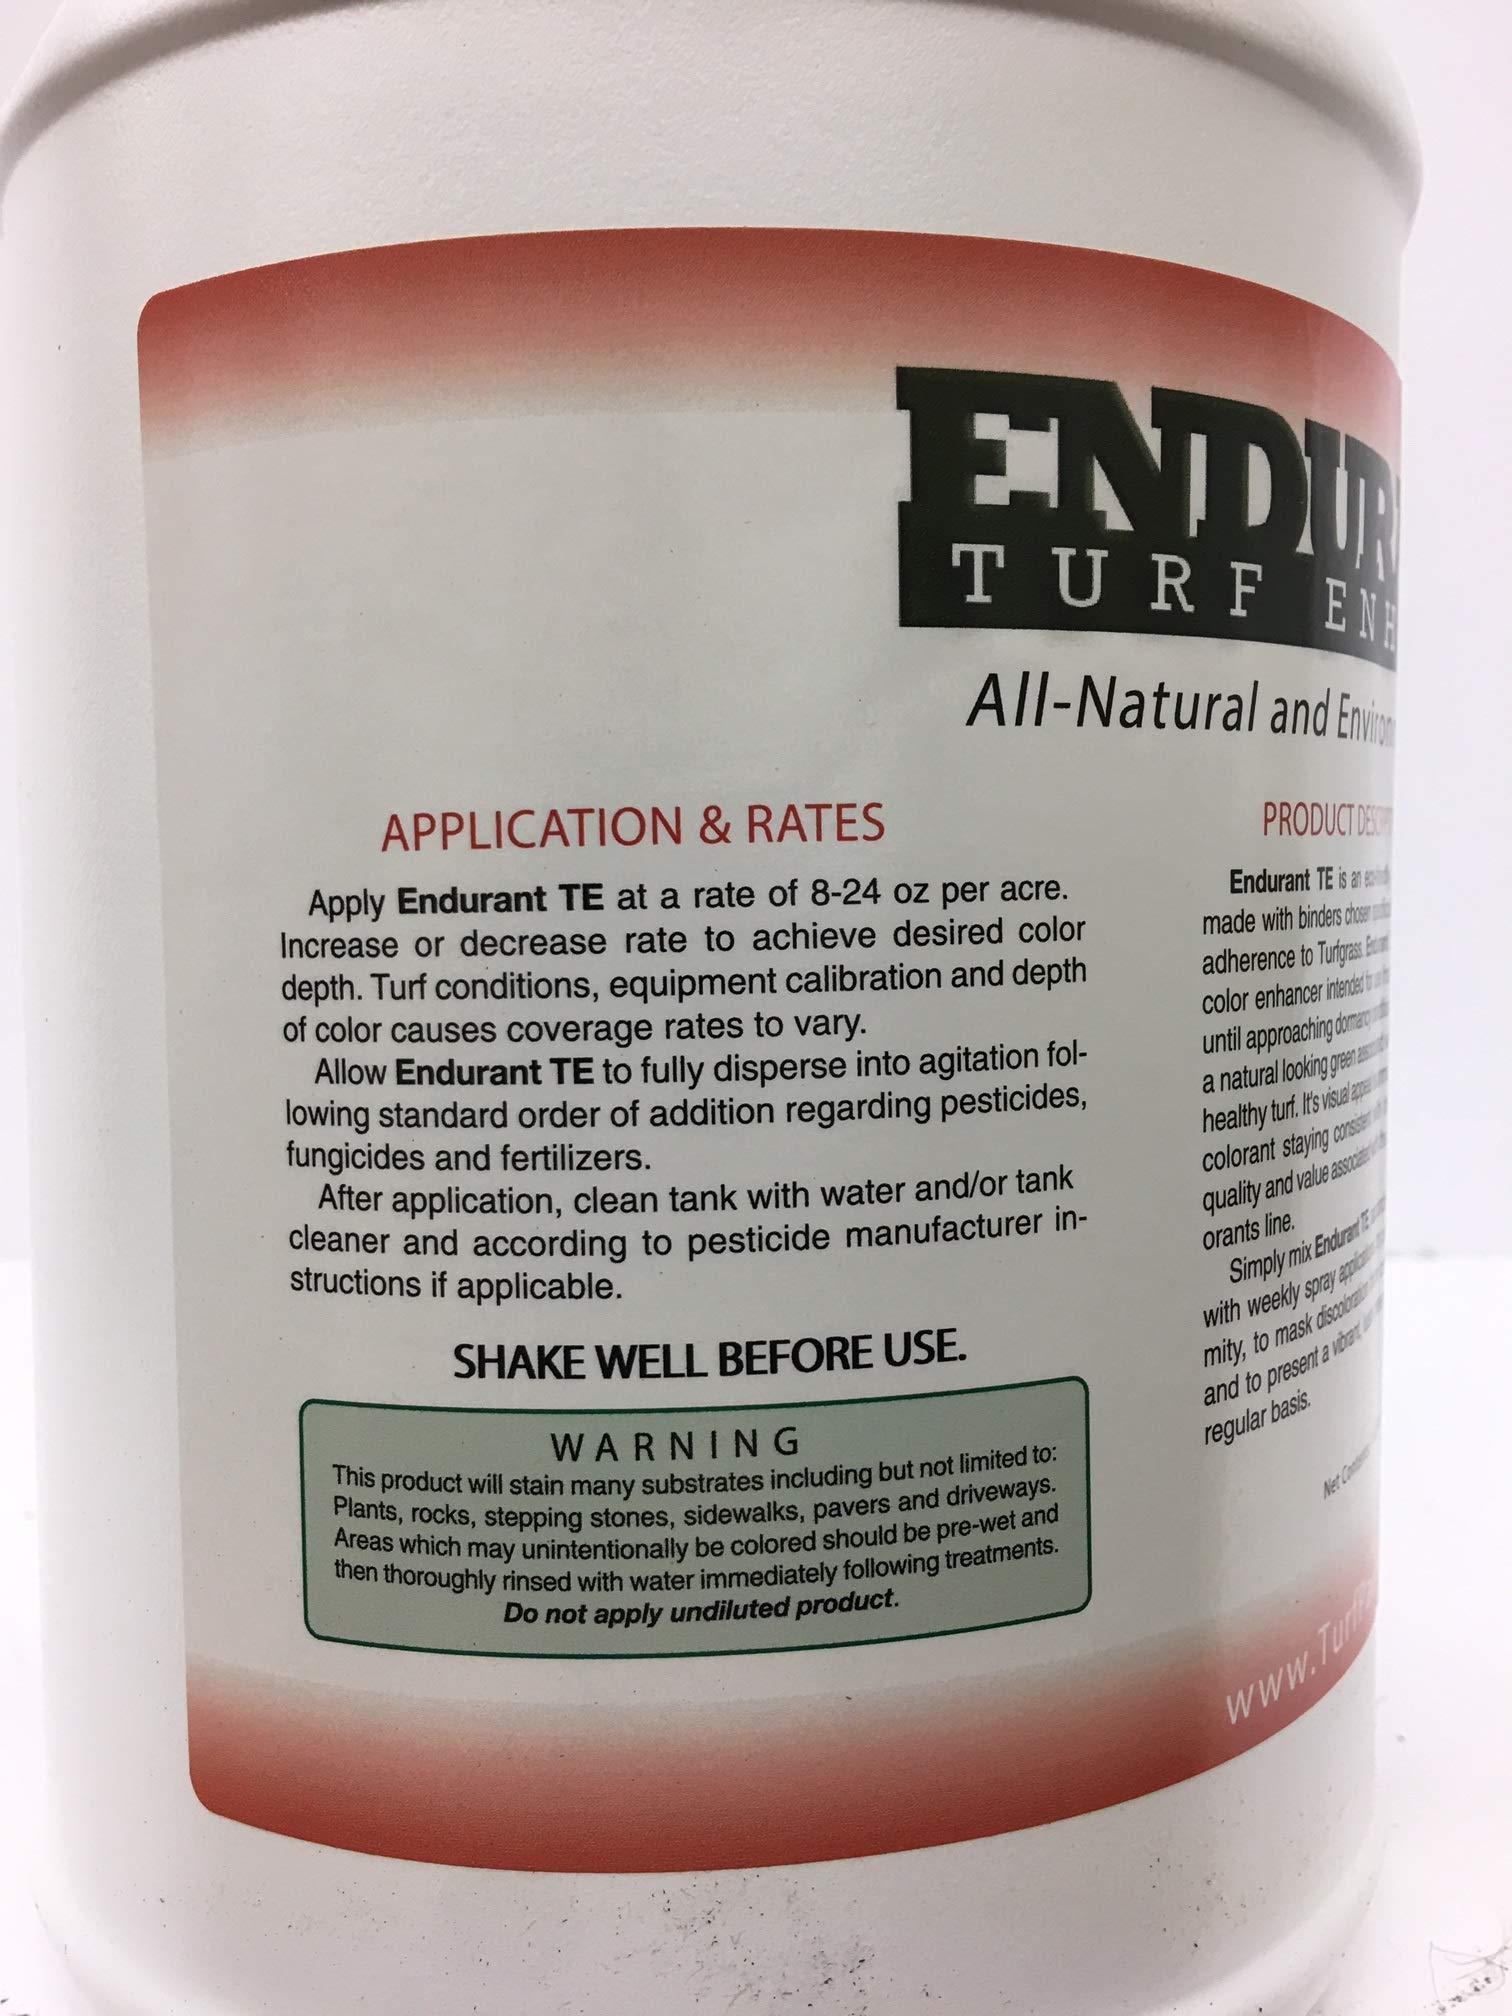 Geoponics Endurant TE (Turf Enhancer) 1 Gallon by Geoponics (Image #2)